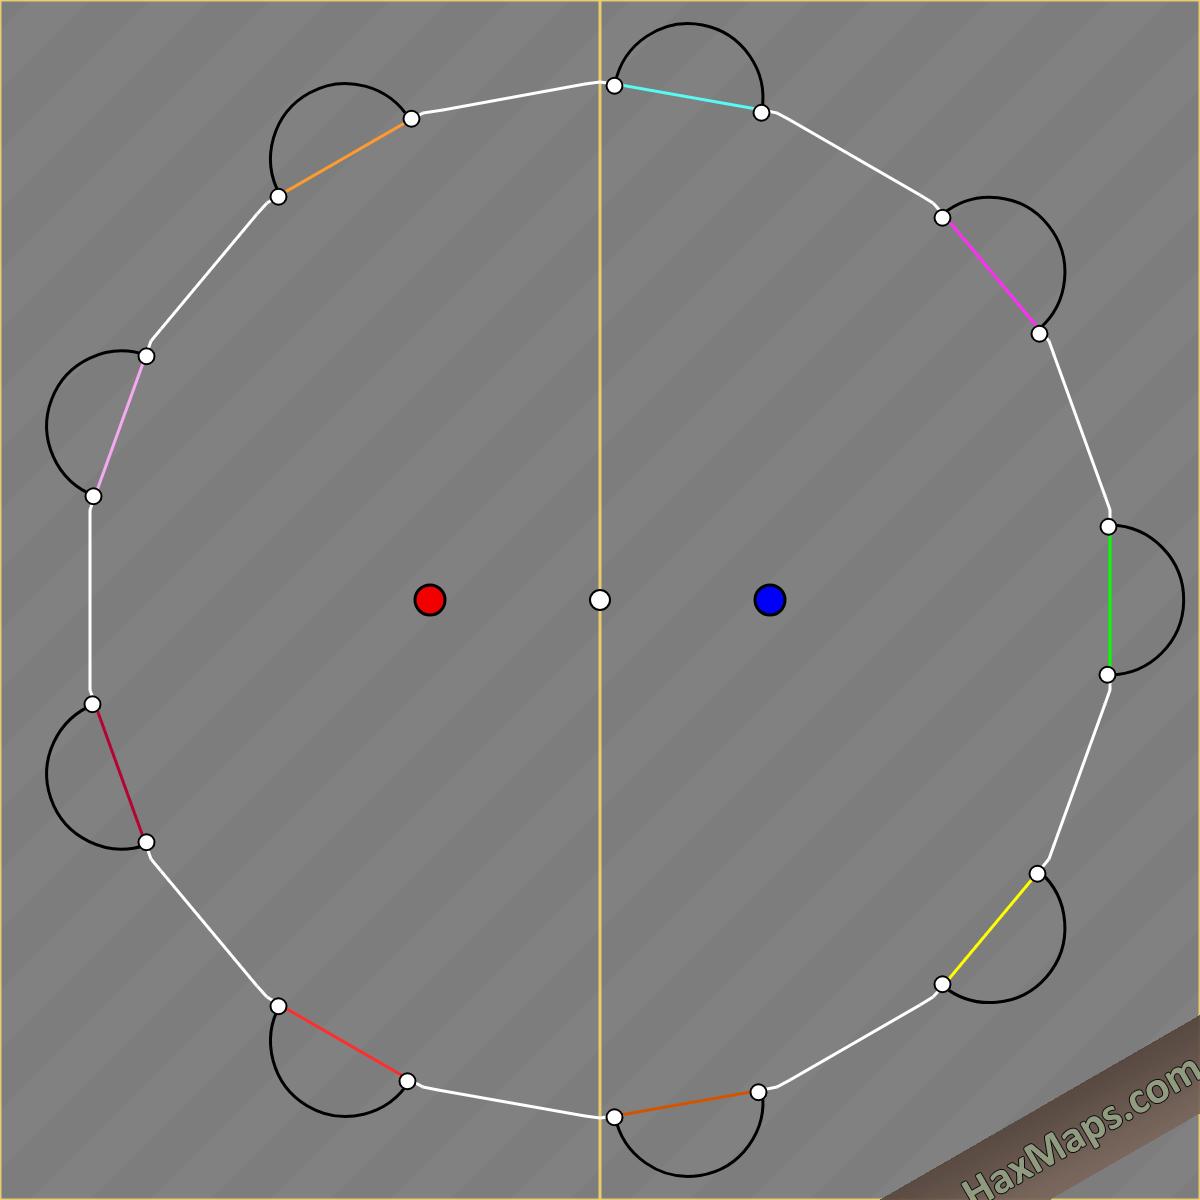 hax ball maps | v9 Japon Kale Full Html Version 2 by Minerva